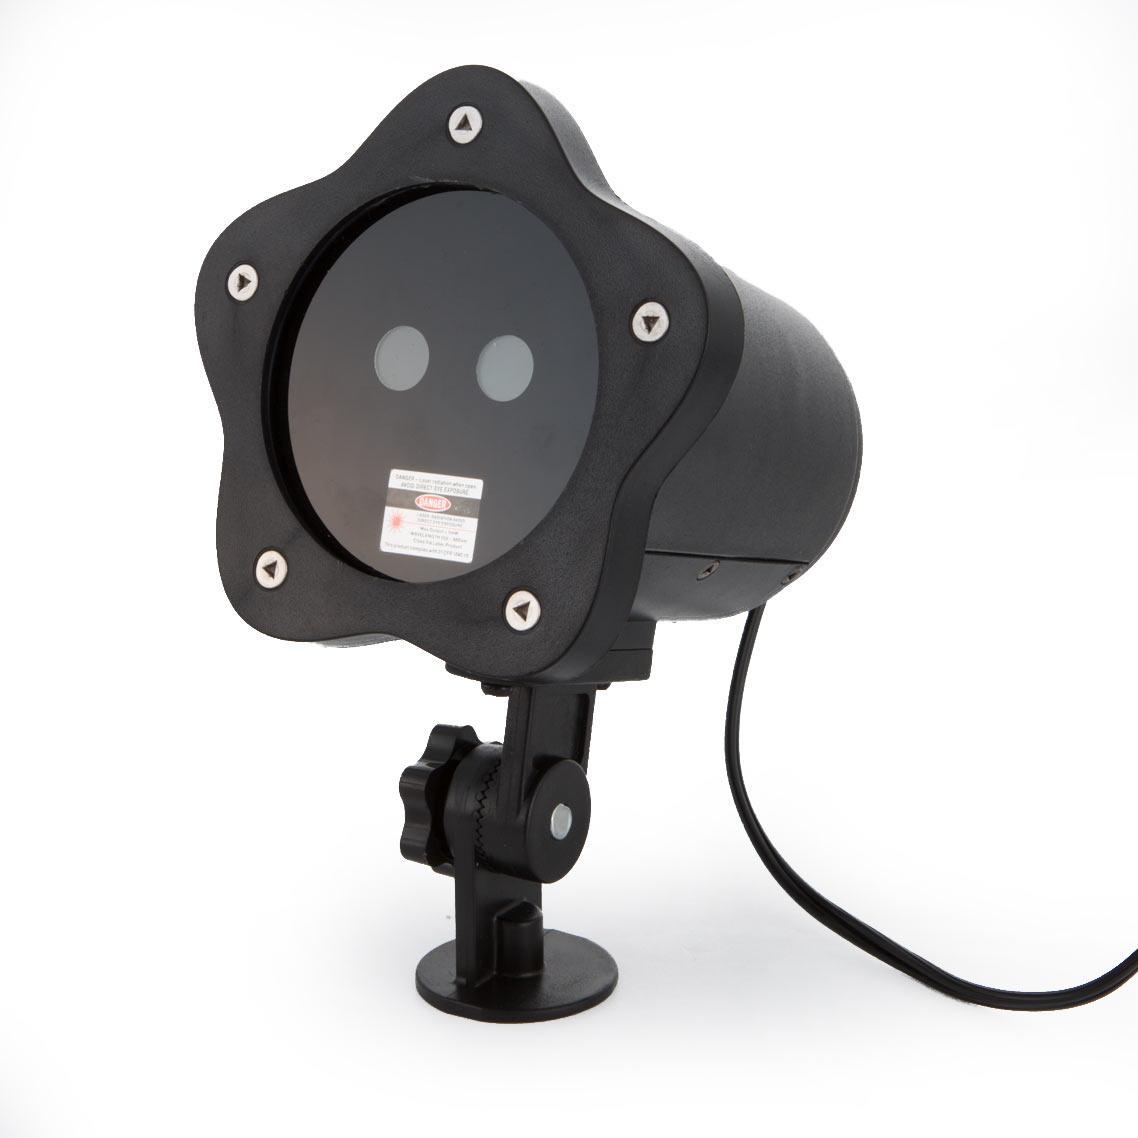 Gartenlaser Laser rot/grün BT9008B RG move Kunststoff – Bild 1